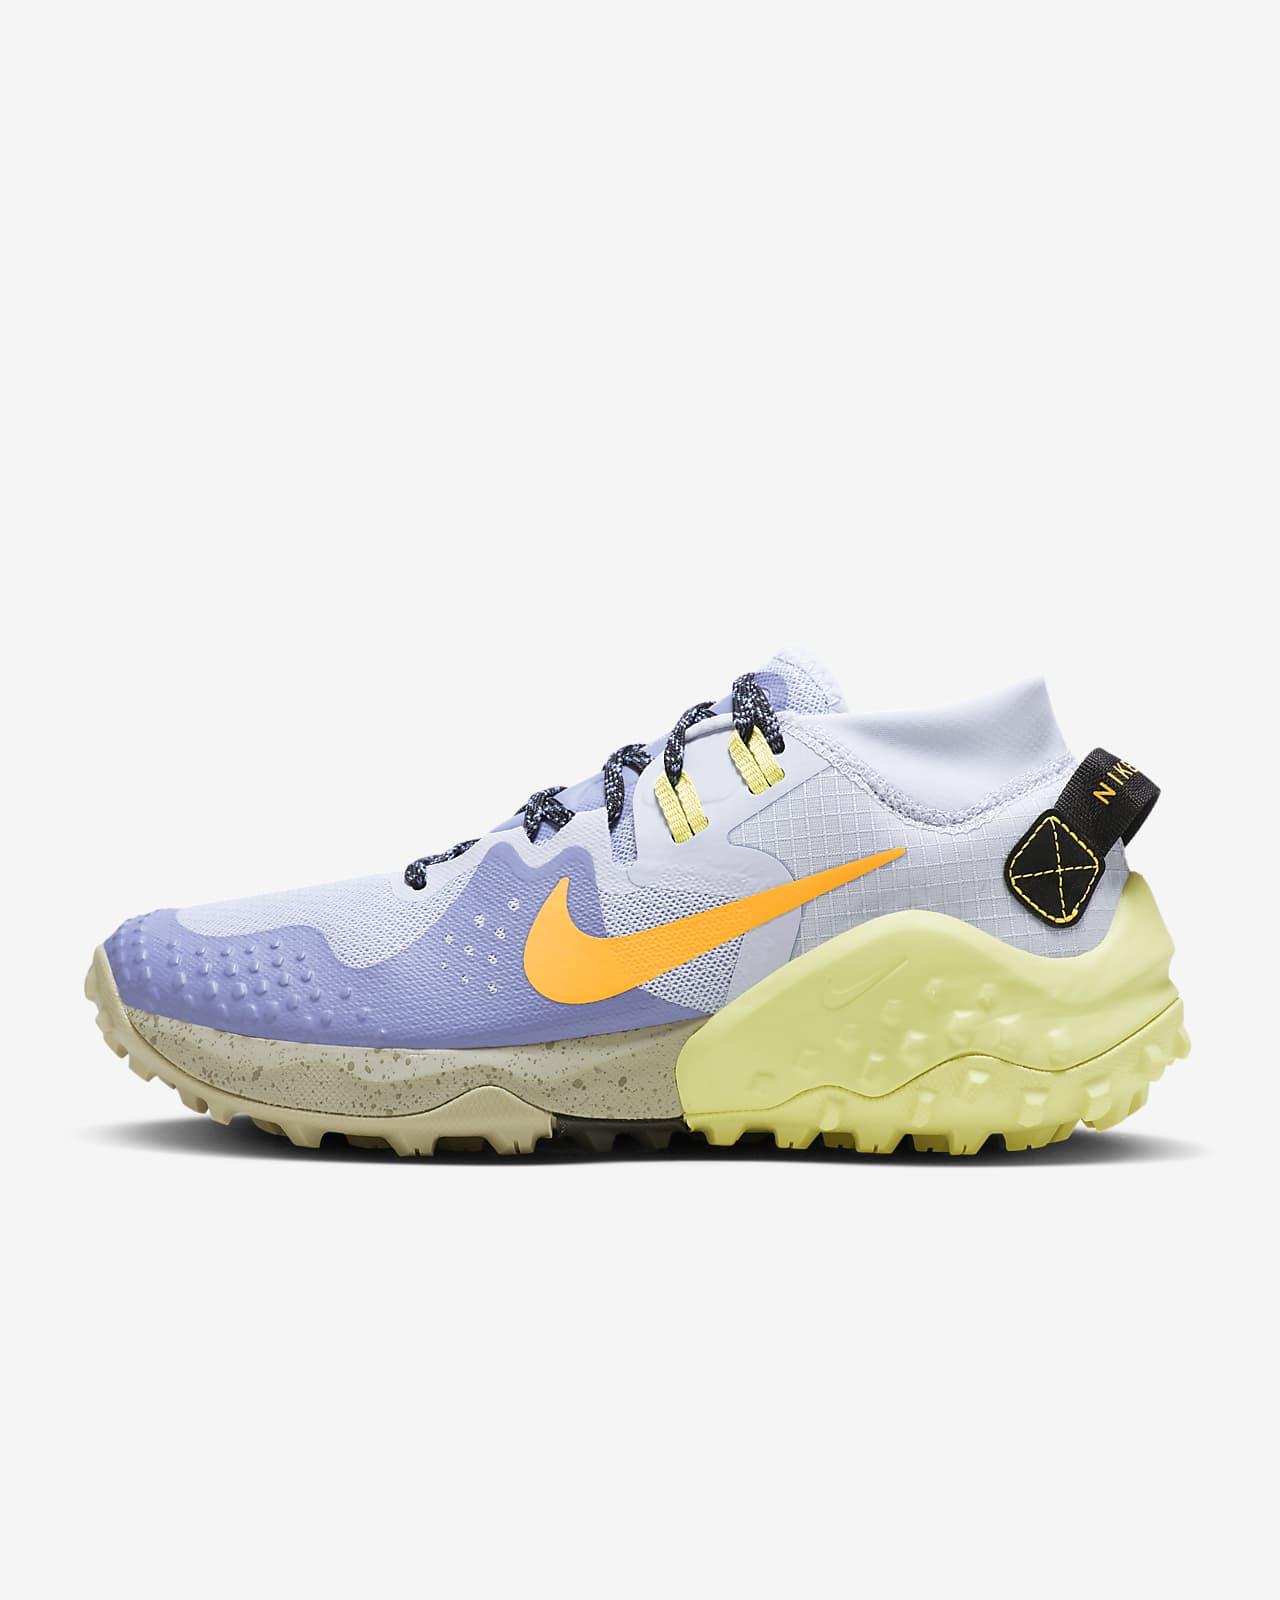 Nike Wildhorse 6 Women's Trail Running Shoe